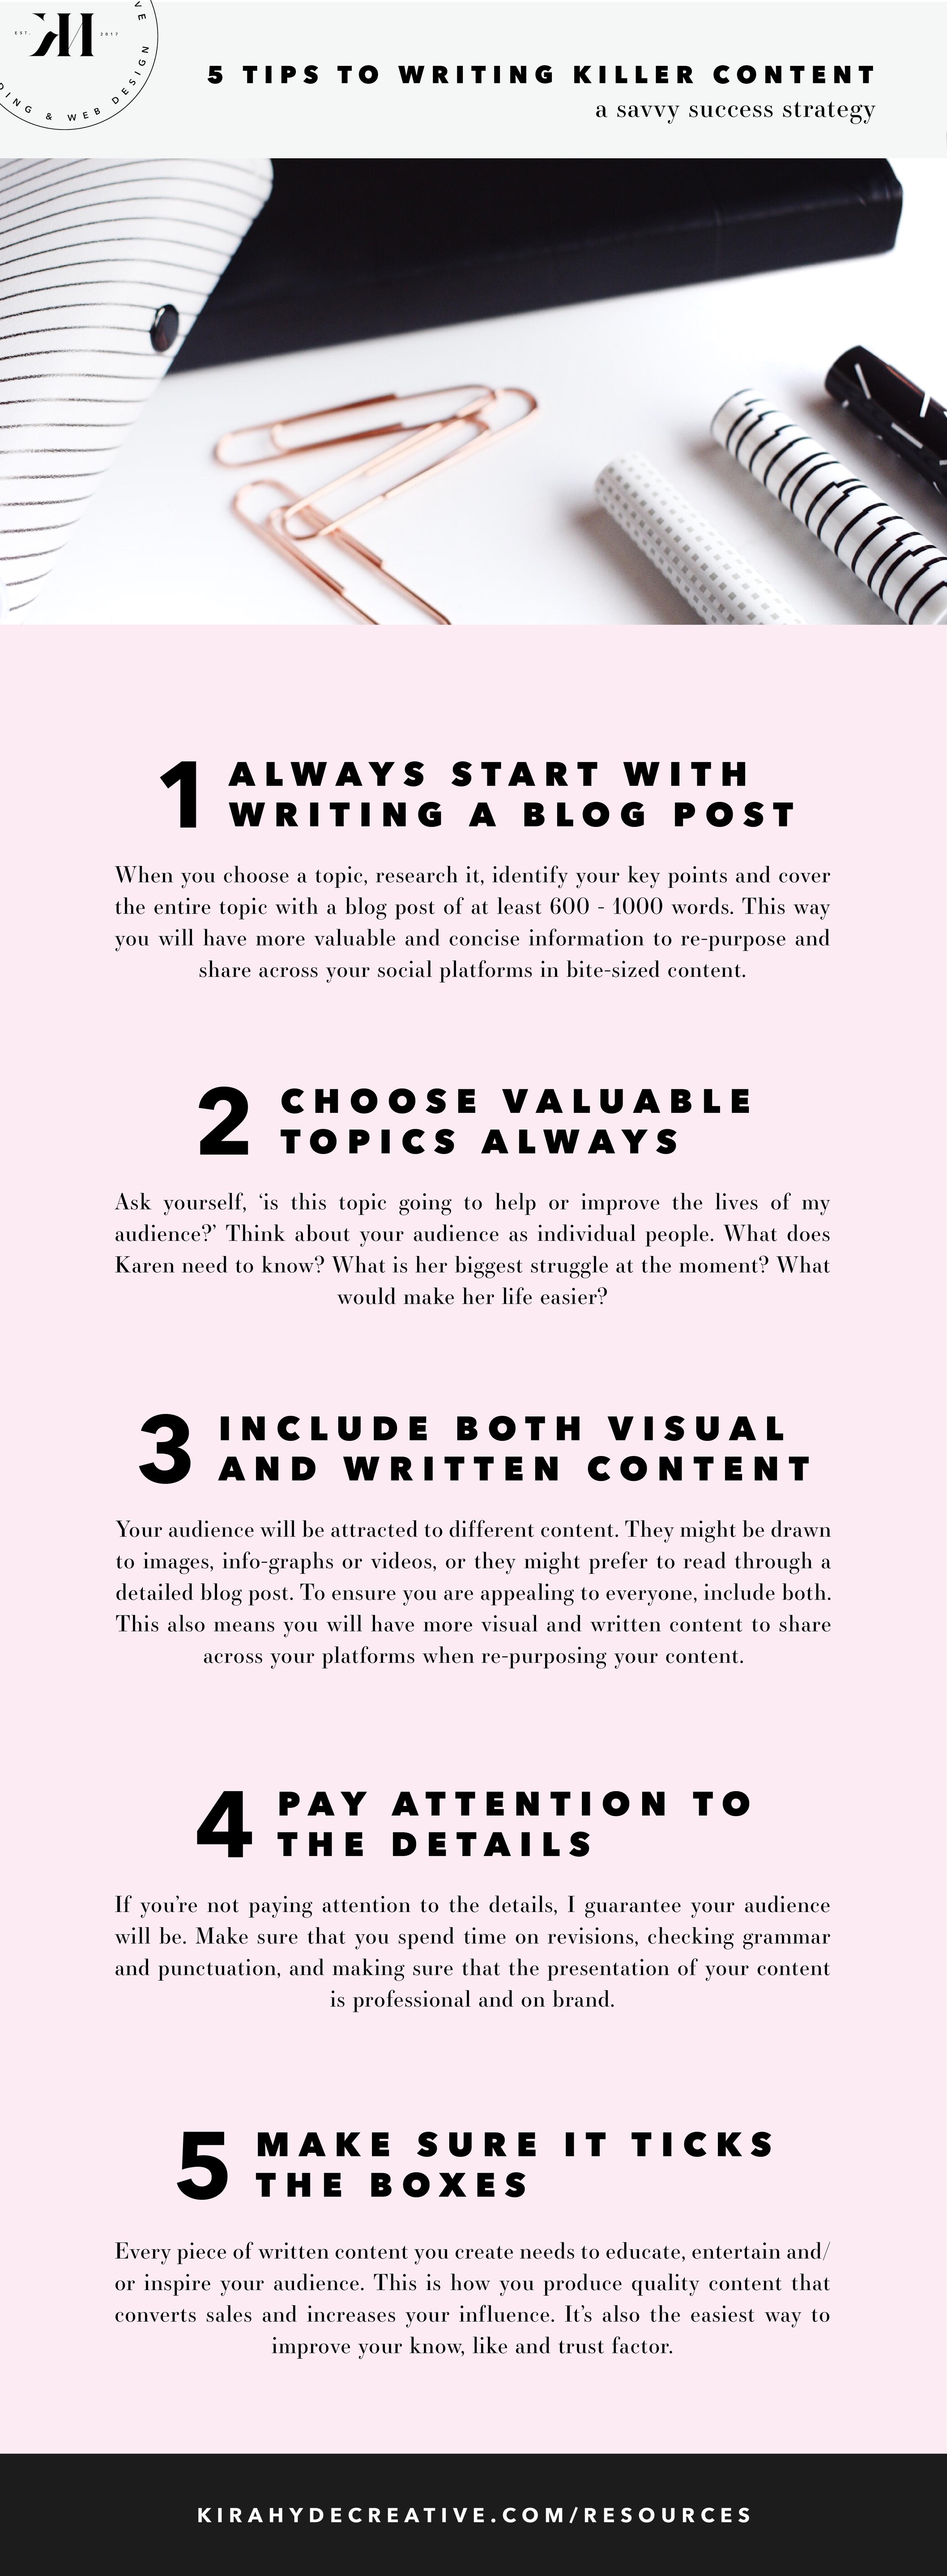 5 Tips to Writing a Killer Blog Post - Kira Hyde Creative